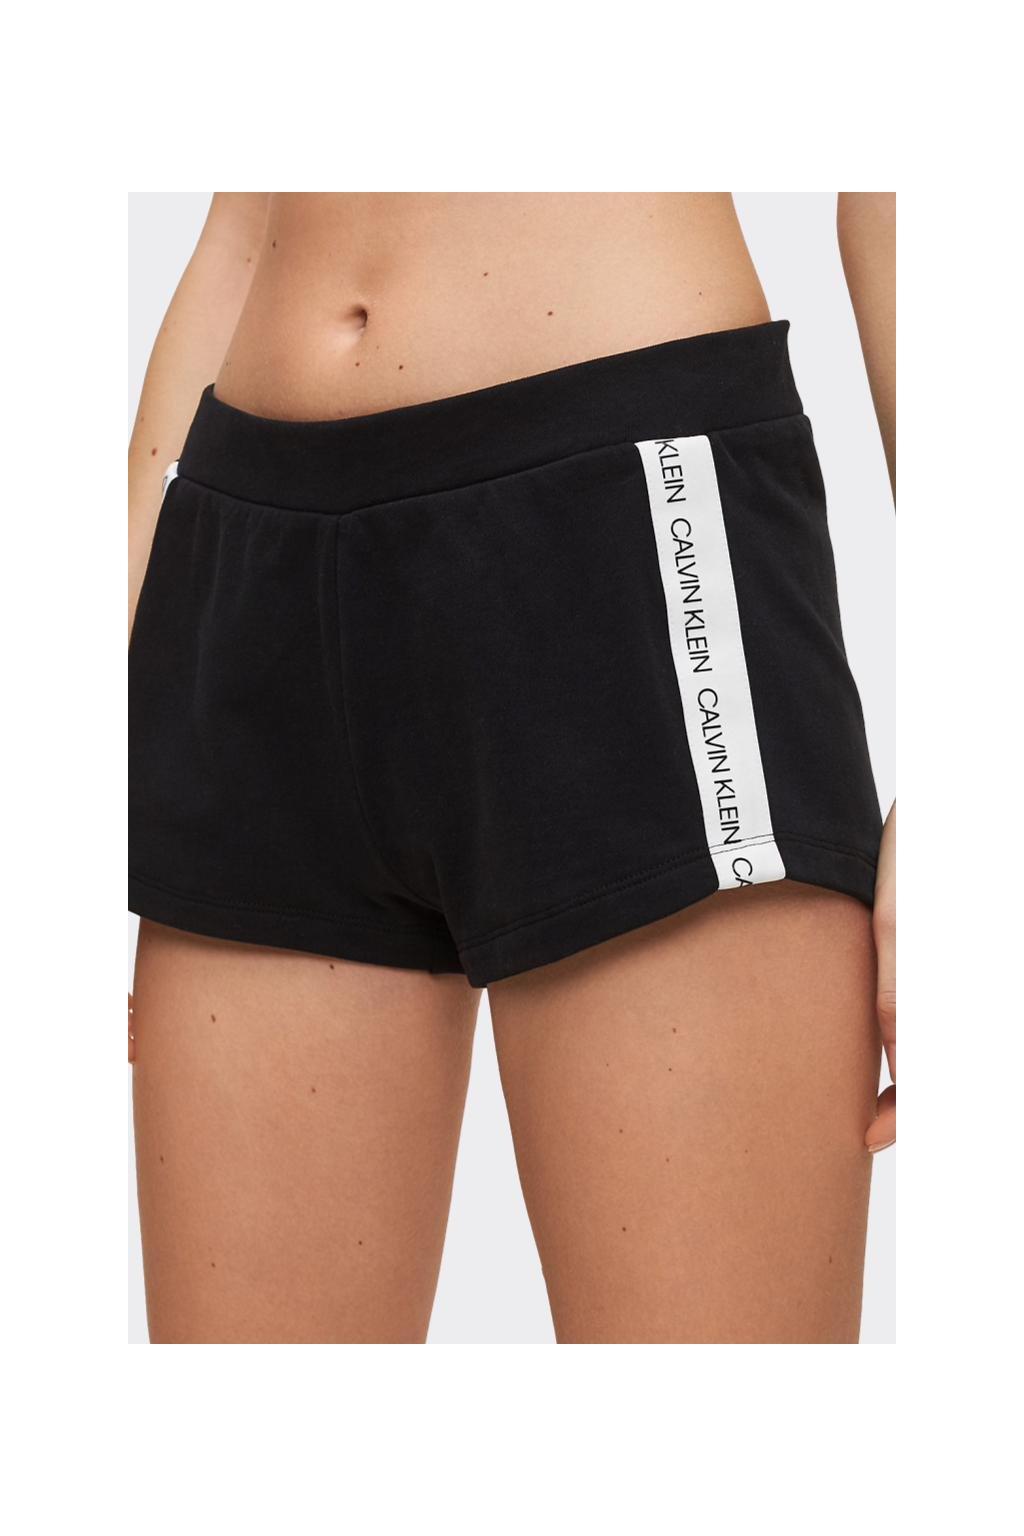 Calvin Klein šortky s logo lemem - černé